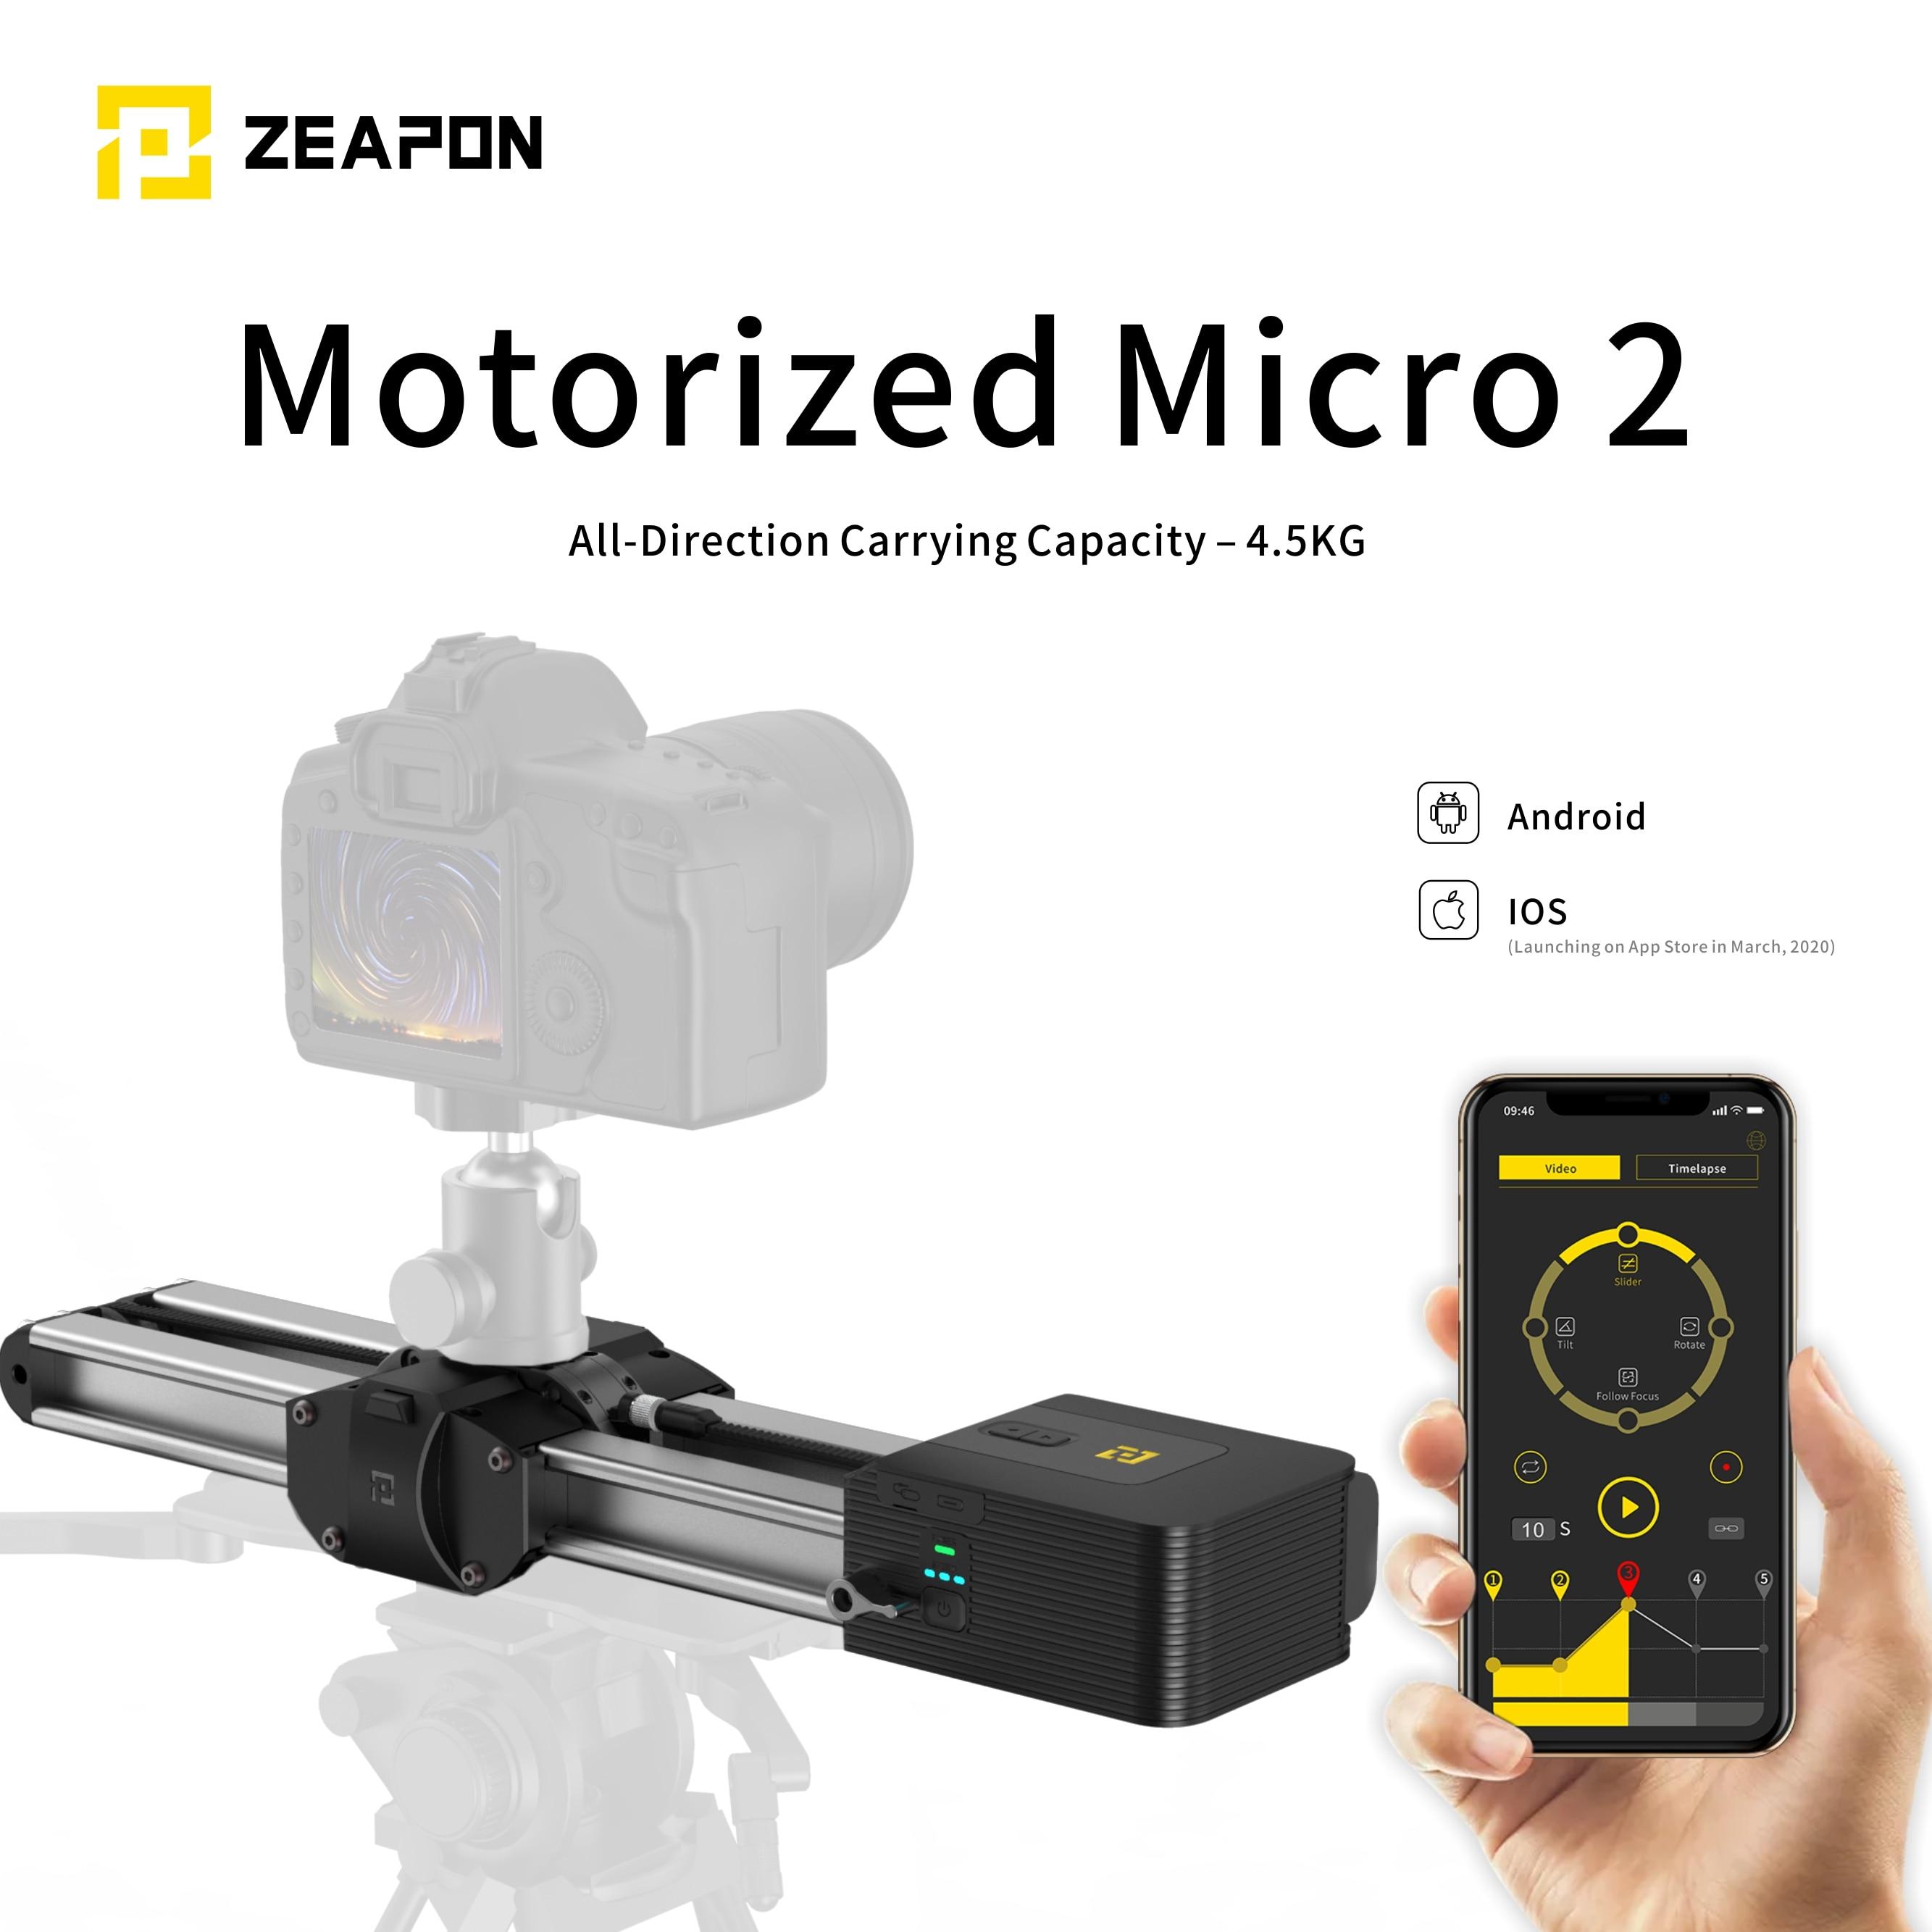 Zeapon Micro 2-كاميرا صغيرة بمحرك ، منزلق متوازي لمسافة مزدوجة ومحمول ، لكاميرا DSLR